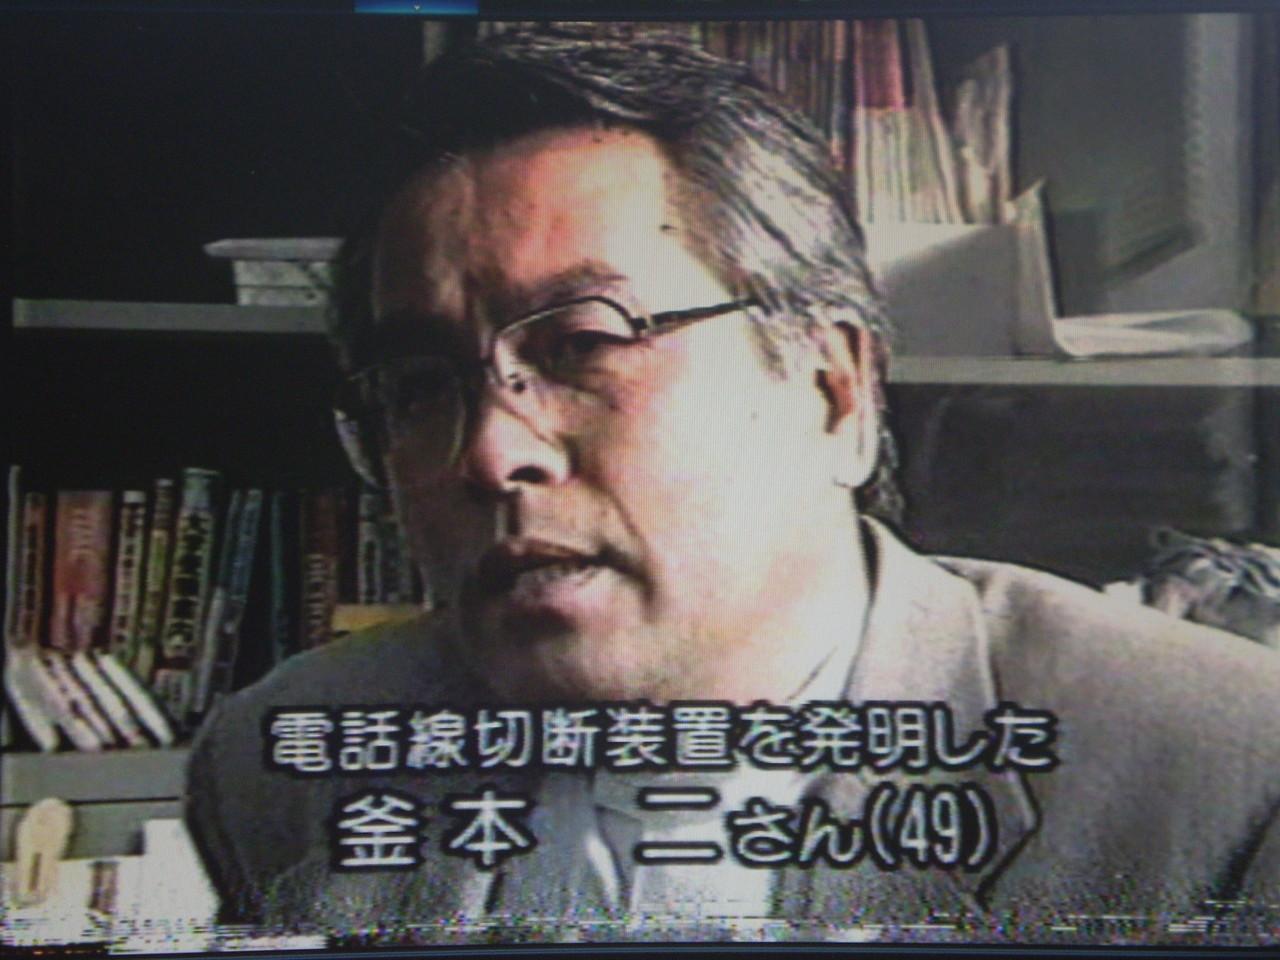 1996.04.11 広島テレビ 地域ニュース (字幕訂正:誤)電話線切断装置 → 正)節電装置